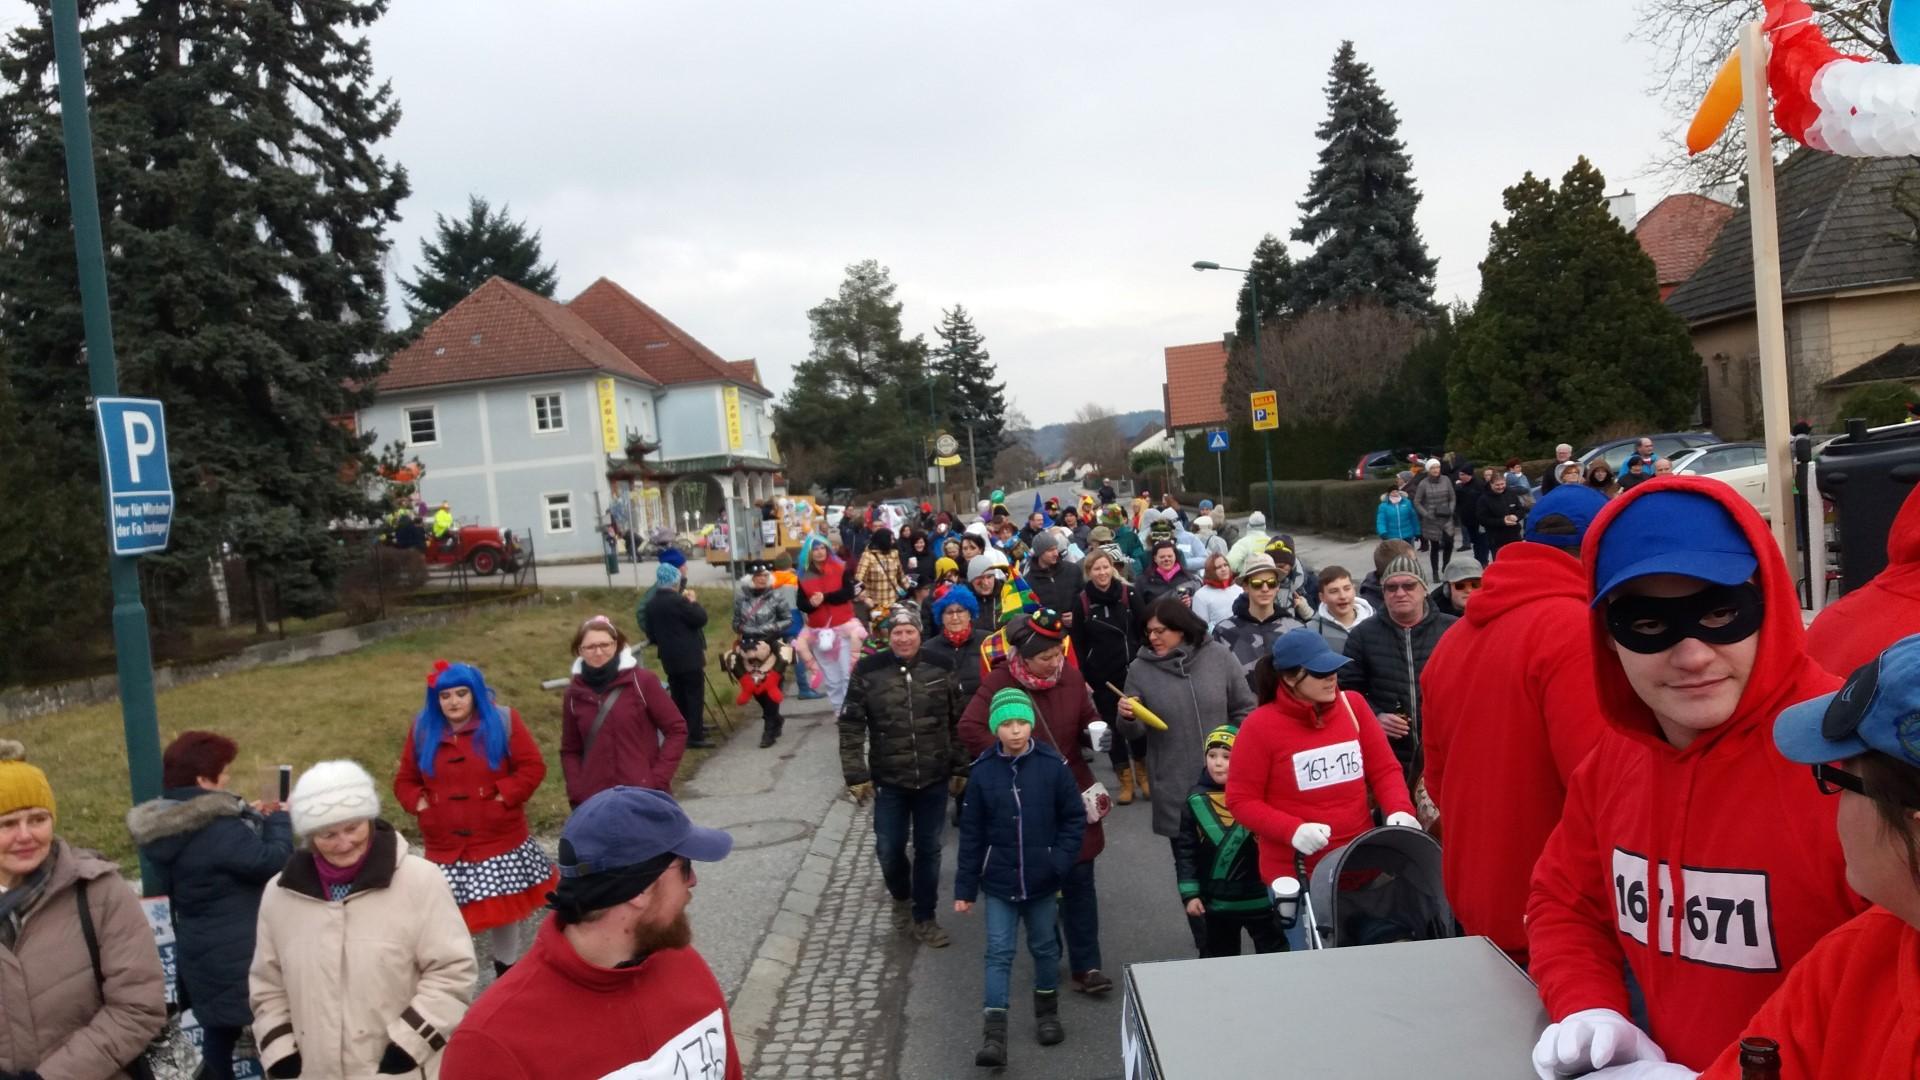 2018.02.13 Faschingsumzug Persenbeug (14) (Large)